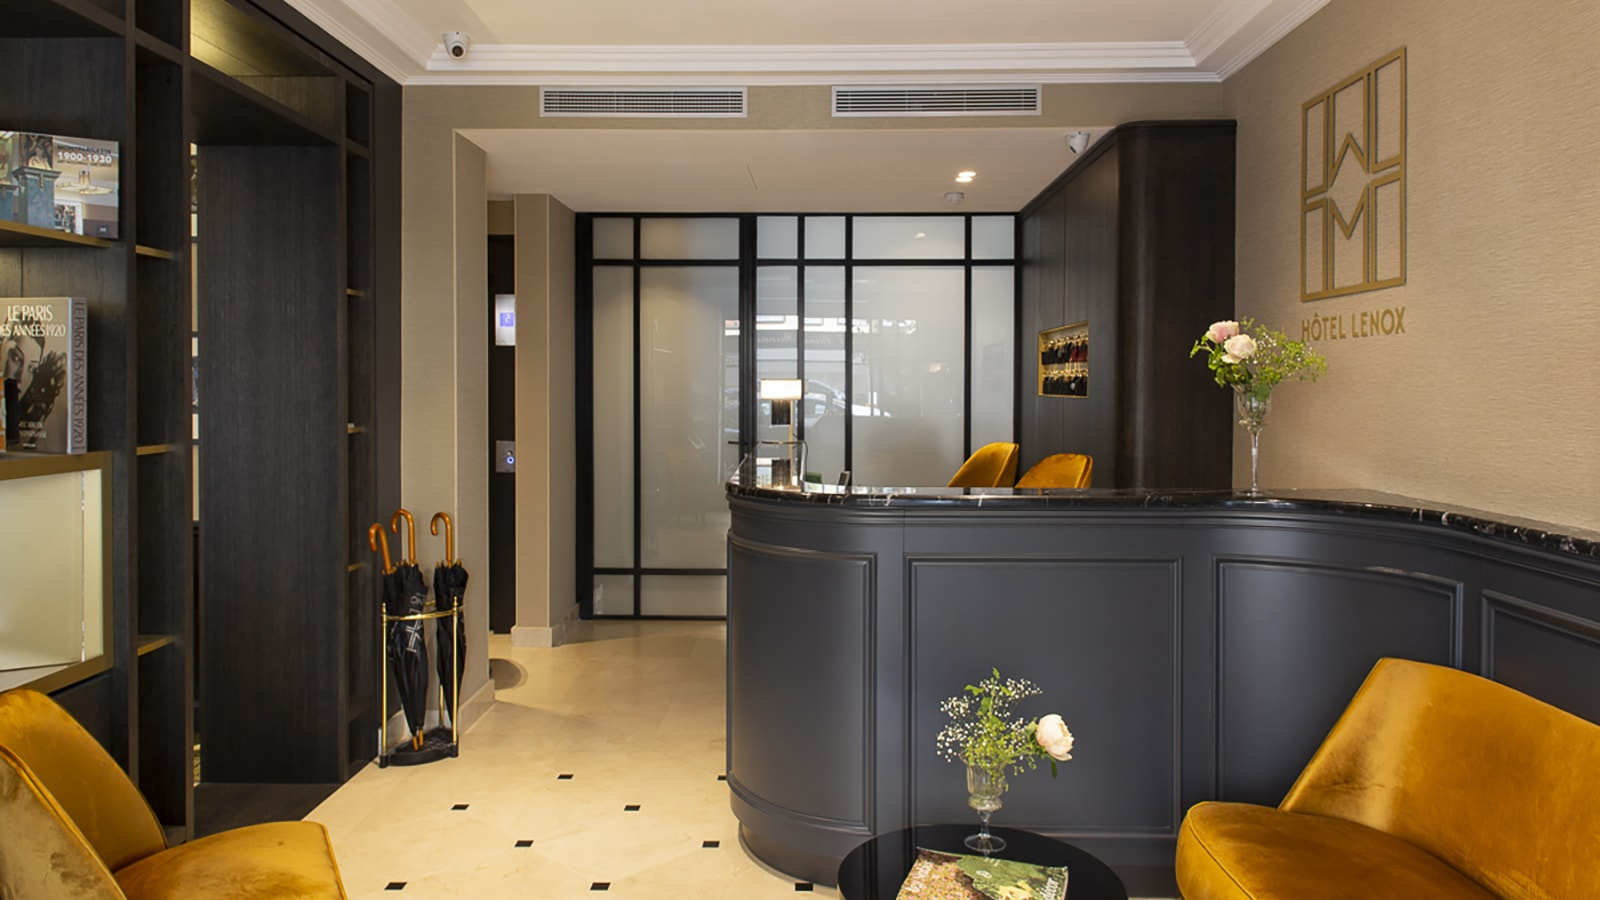 EFI Design Hotel Lenox Paris Efi Design (1) 1155